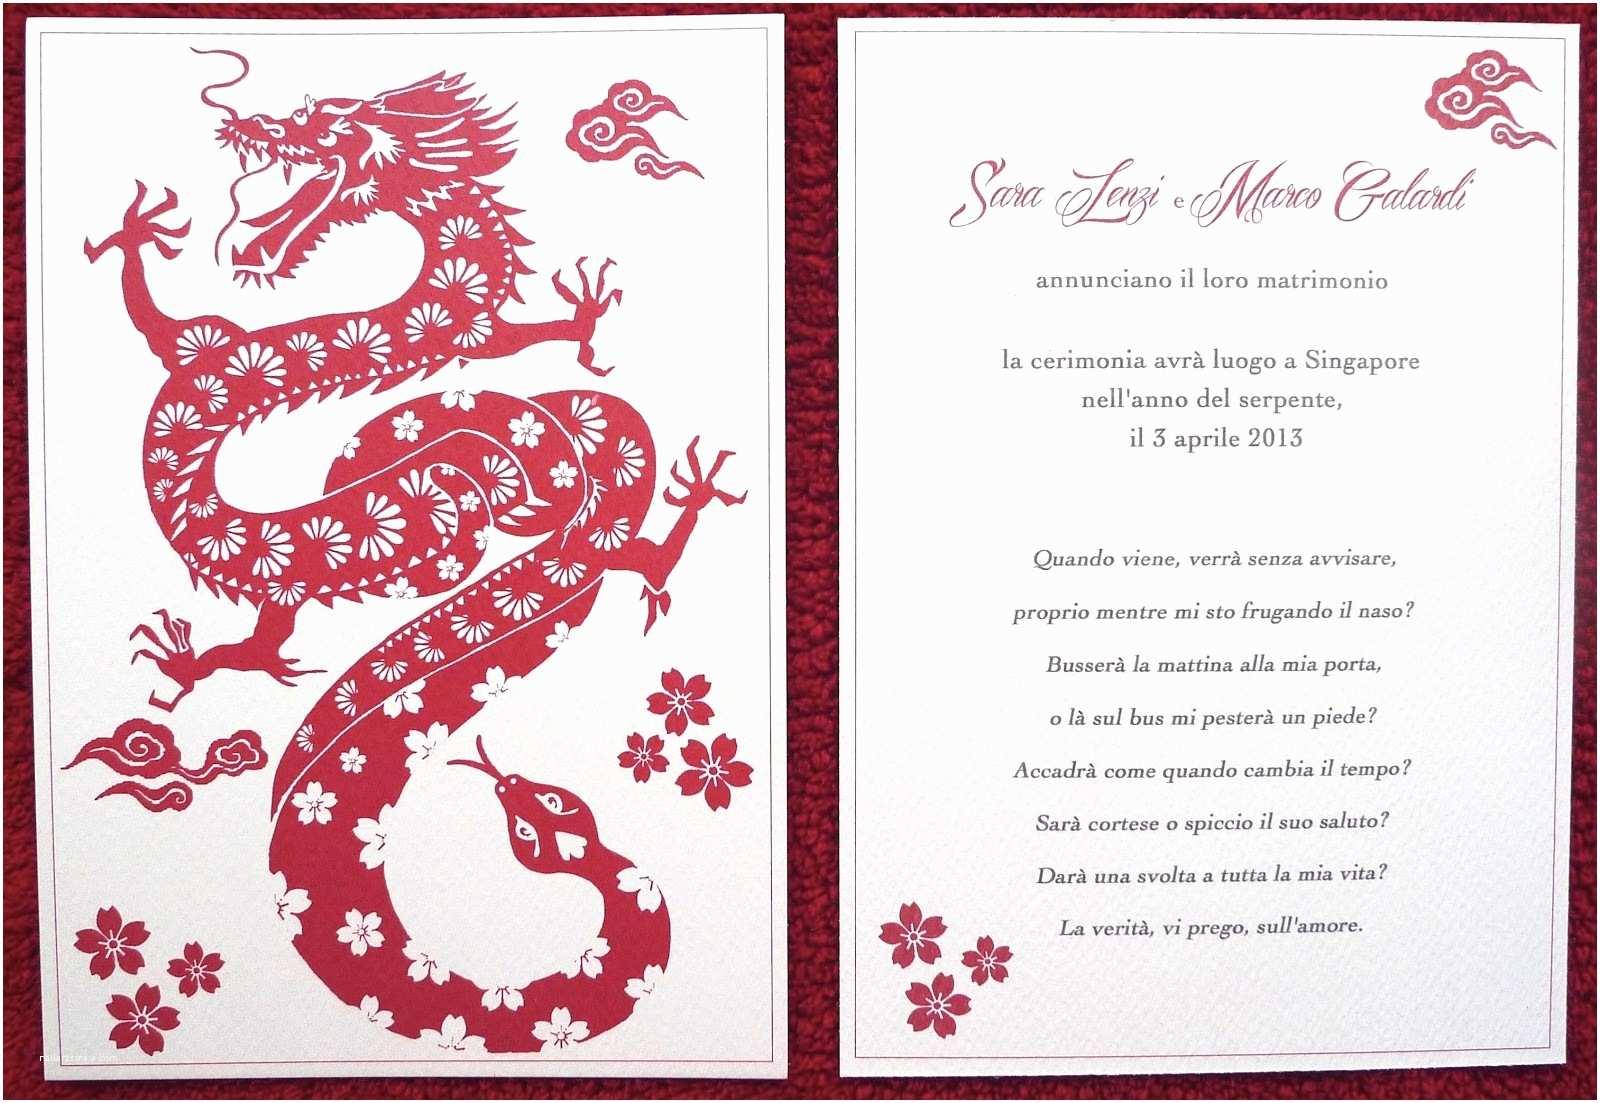 Chinese Wedding Invitation Chinese Wedding Invitation Templates Cloudinvitation